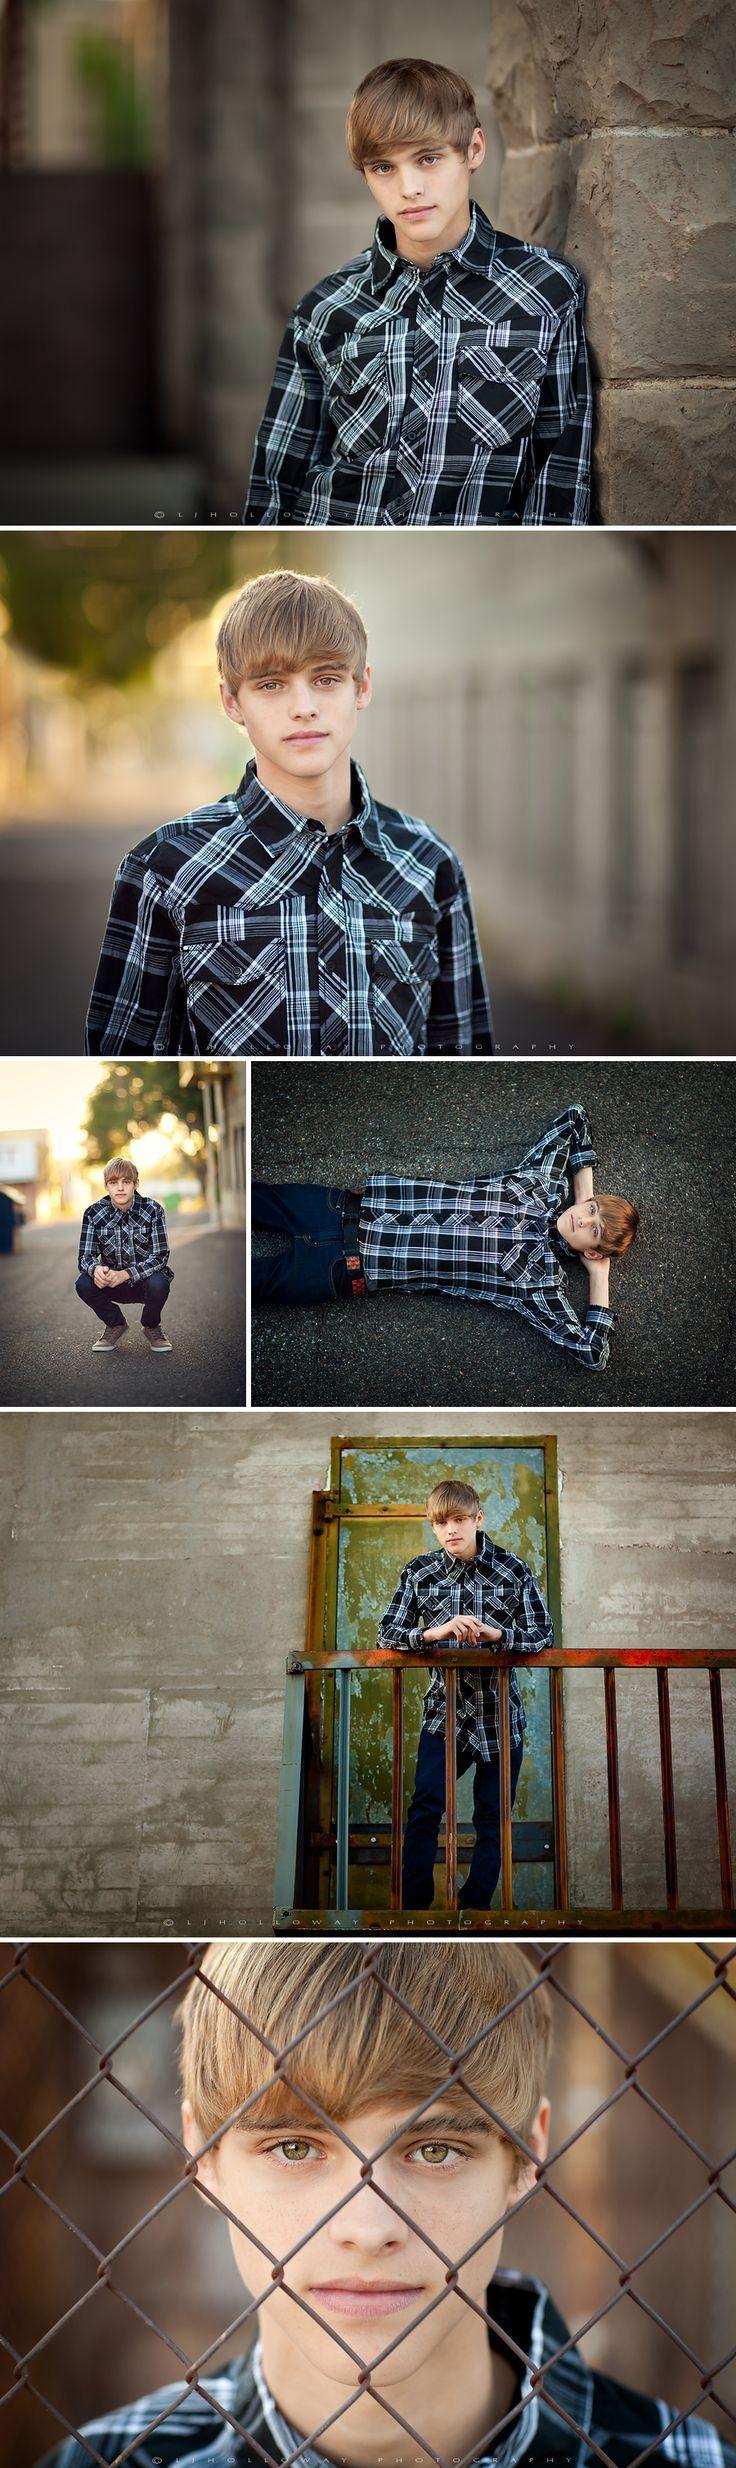 Clint_Blog01_Kingman Arizona Teen Photographer_Las Vegas Nevada Teen Photographer